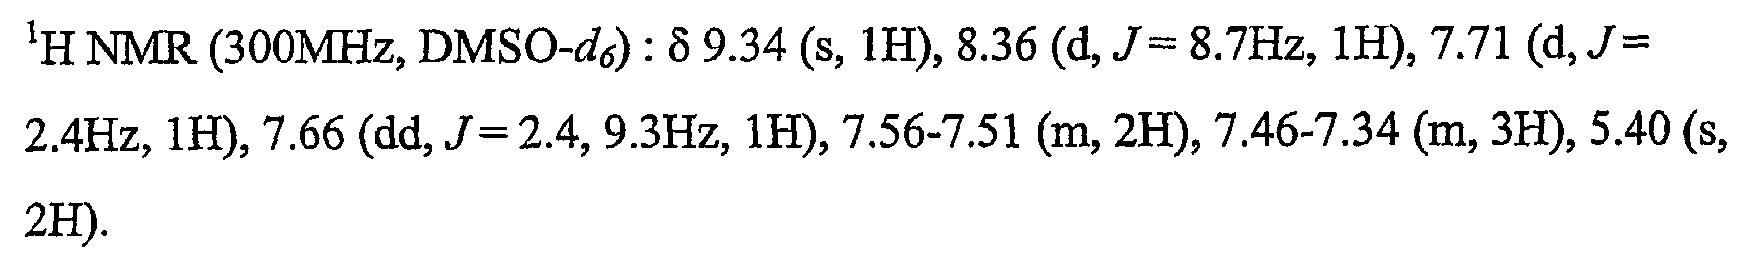 Figure 112006013759285-pct00105